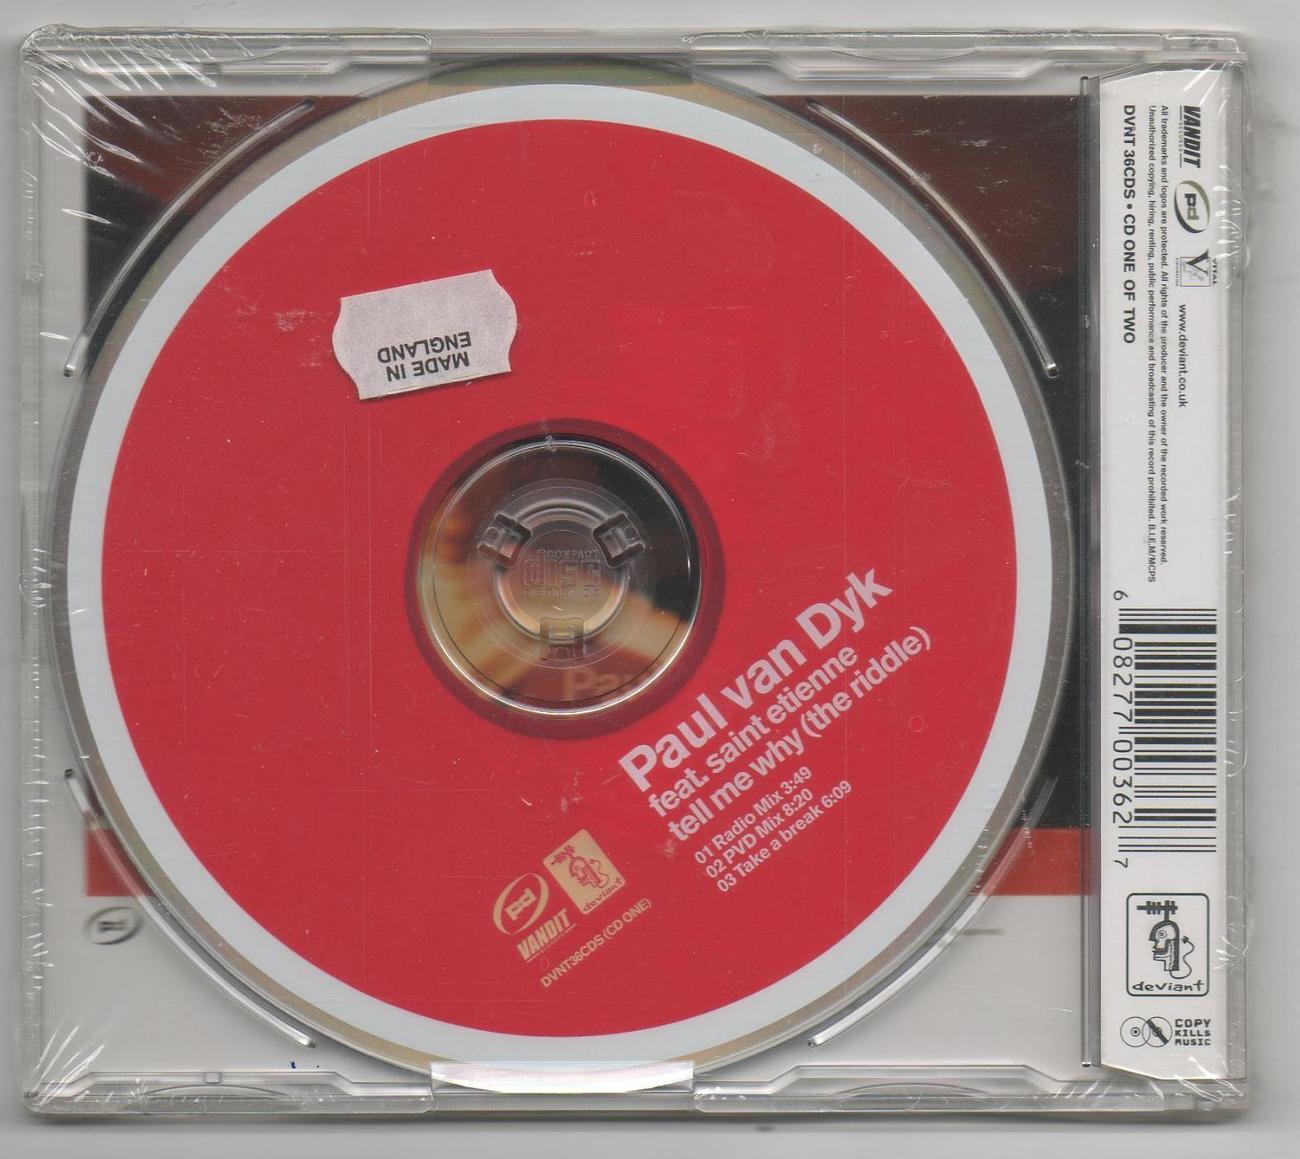 Paul Van Dyk Ft. Saint Etienne Tell Me Why The Riddle CD 3 Track Remixes Vandit